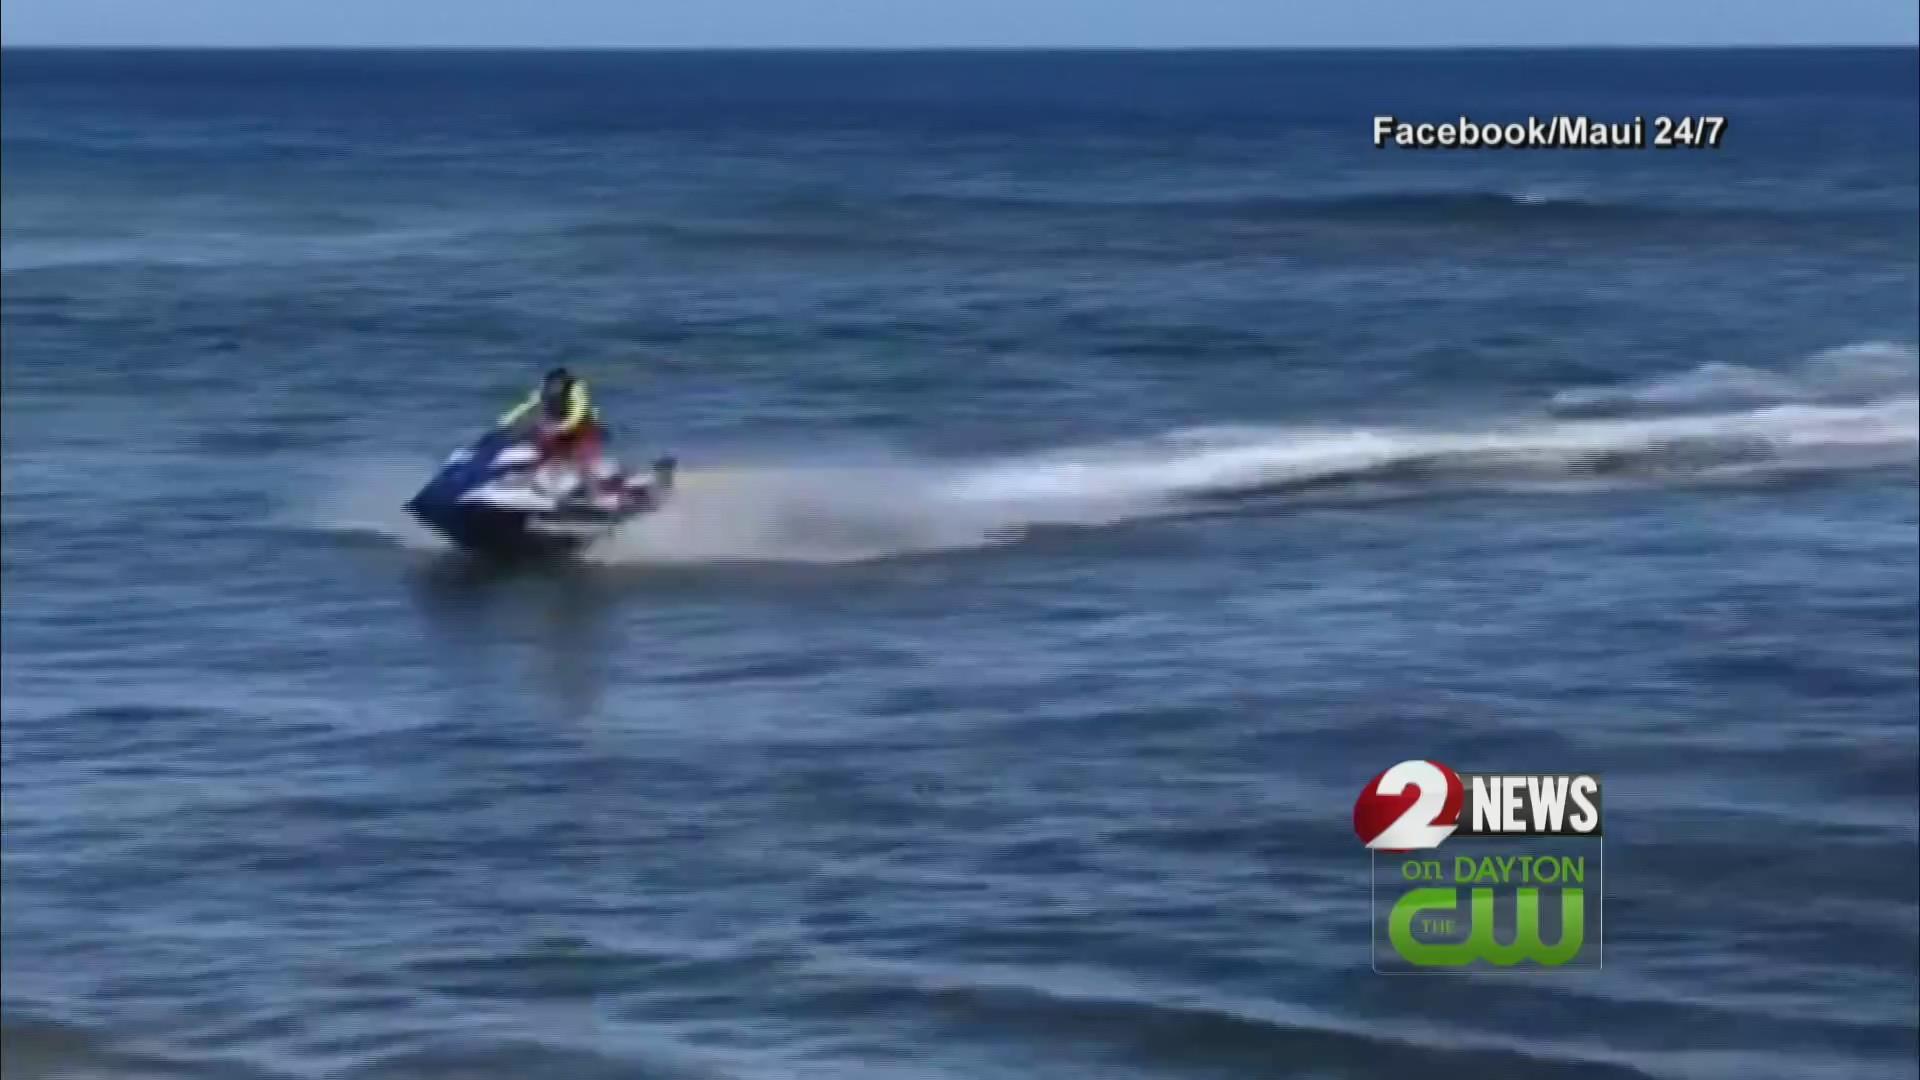 Shark kills California man, 65, in Maui, Hawaii